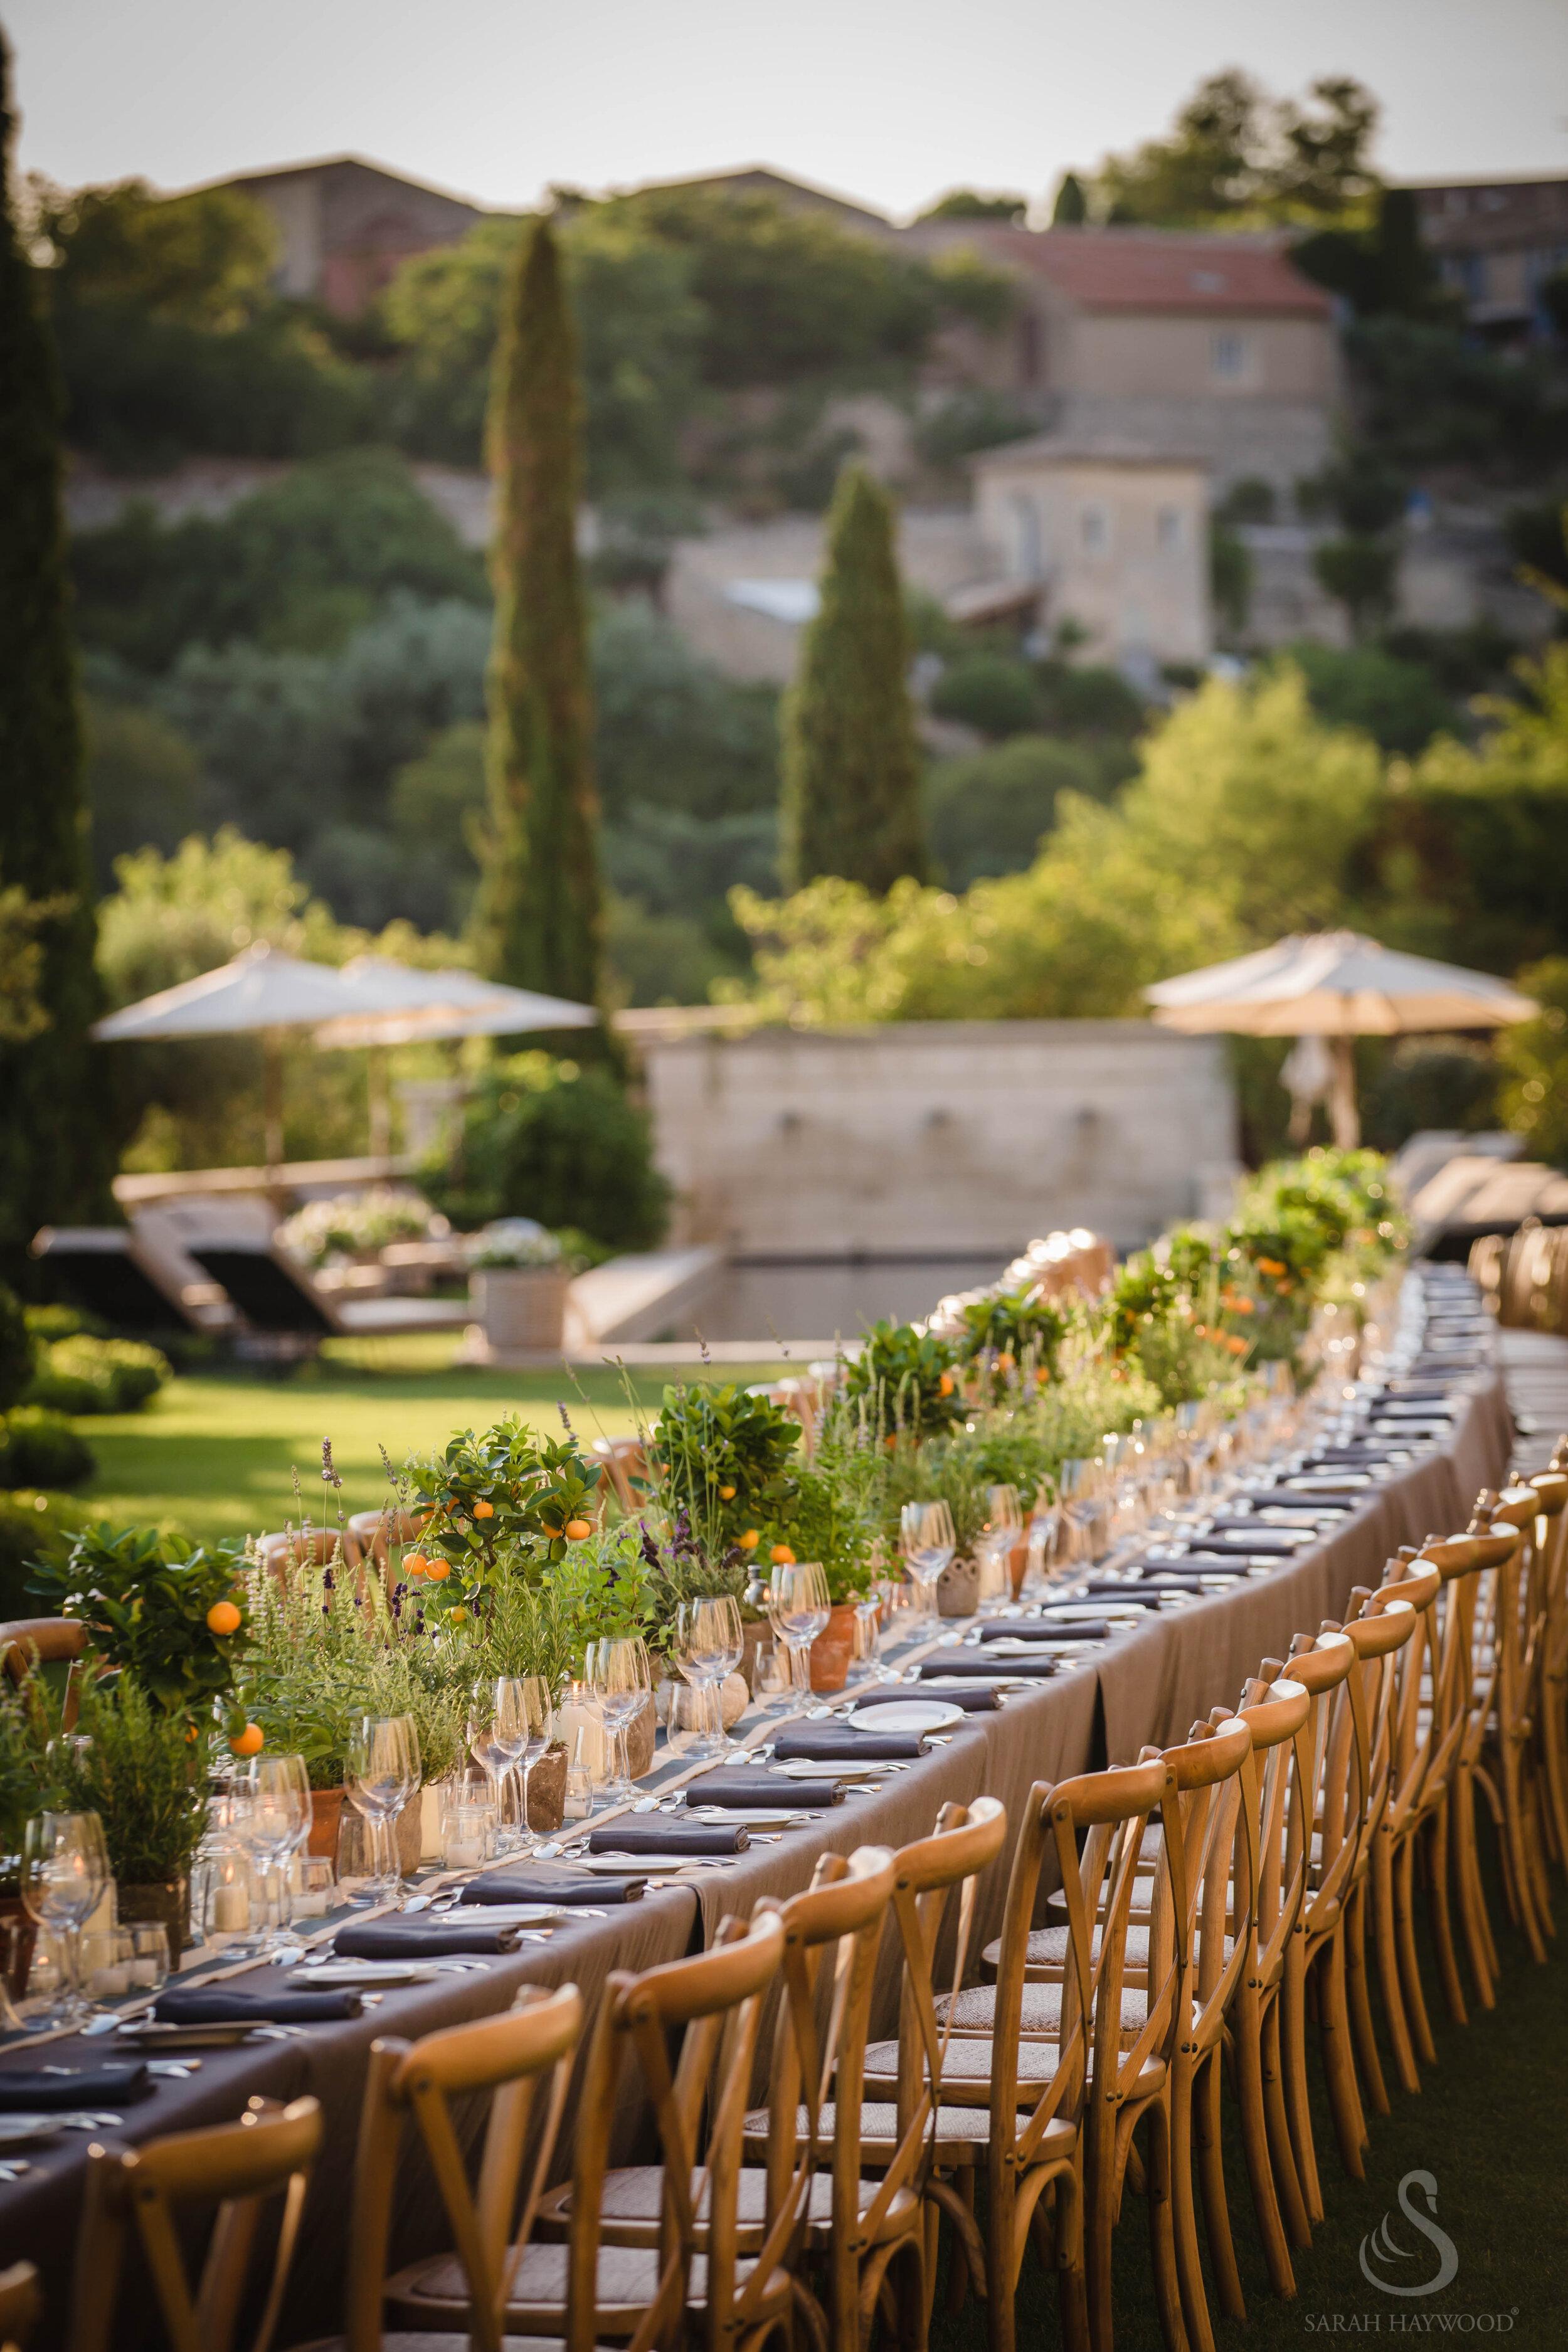 luxury-destination-wedding-Provence-France-sarah-haywood-copyright-Filmatography.13.jpg